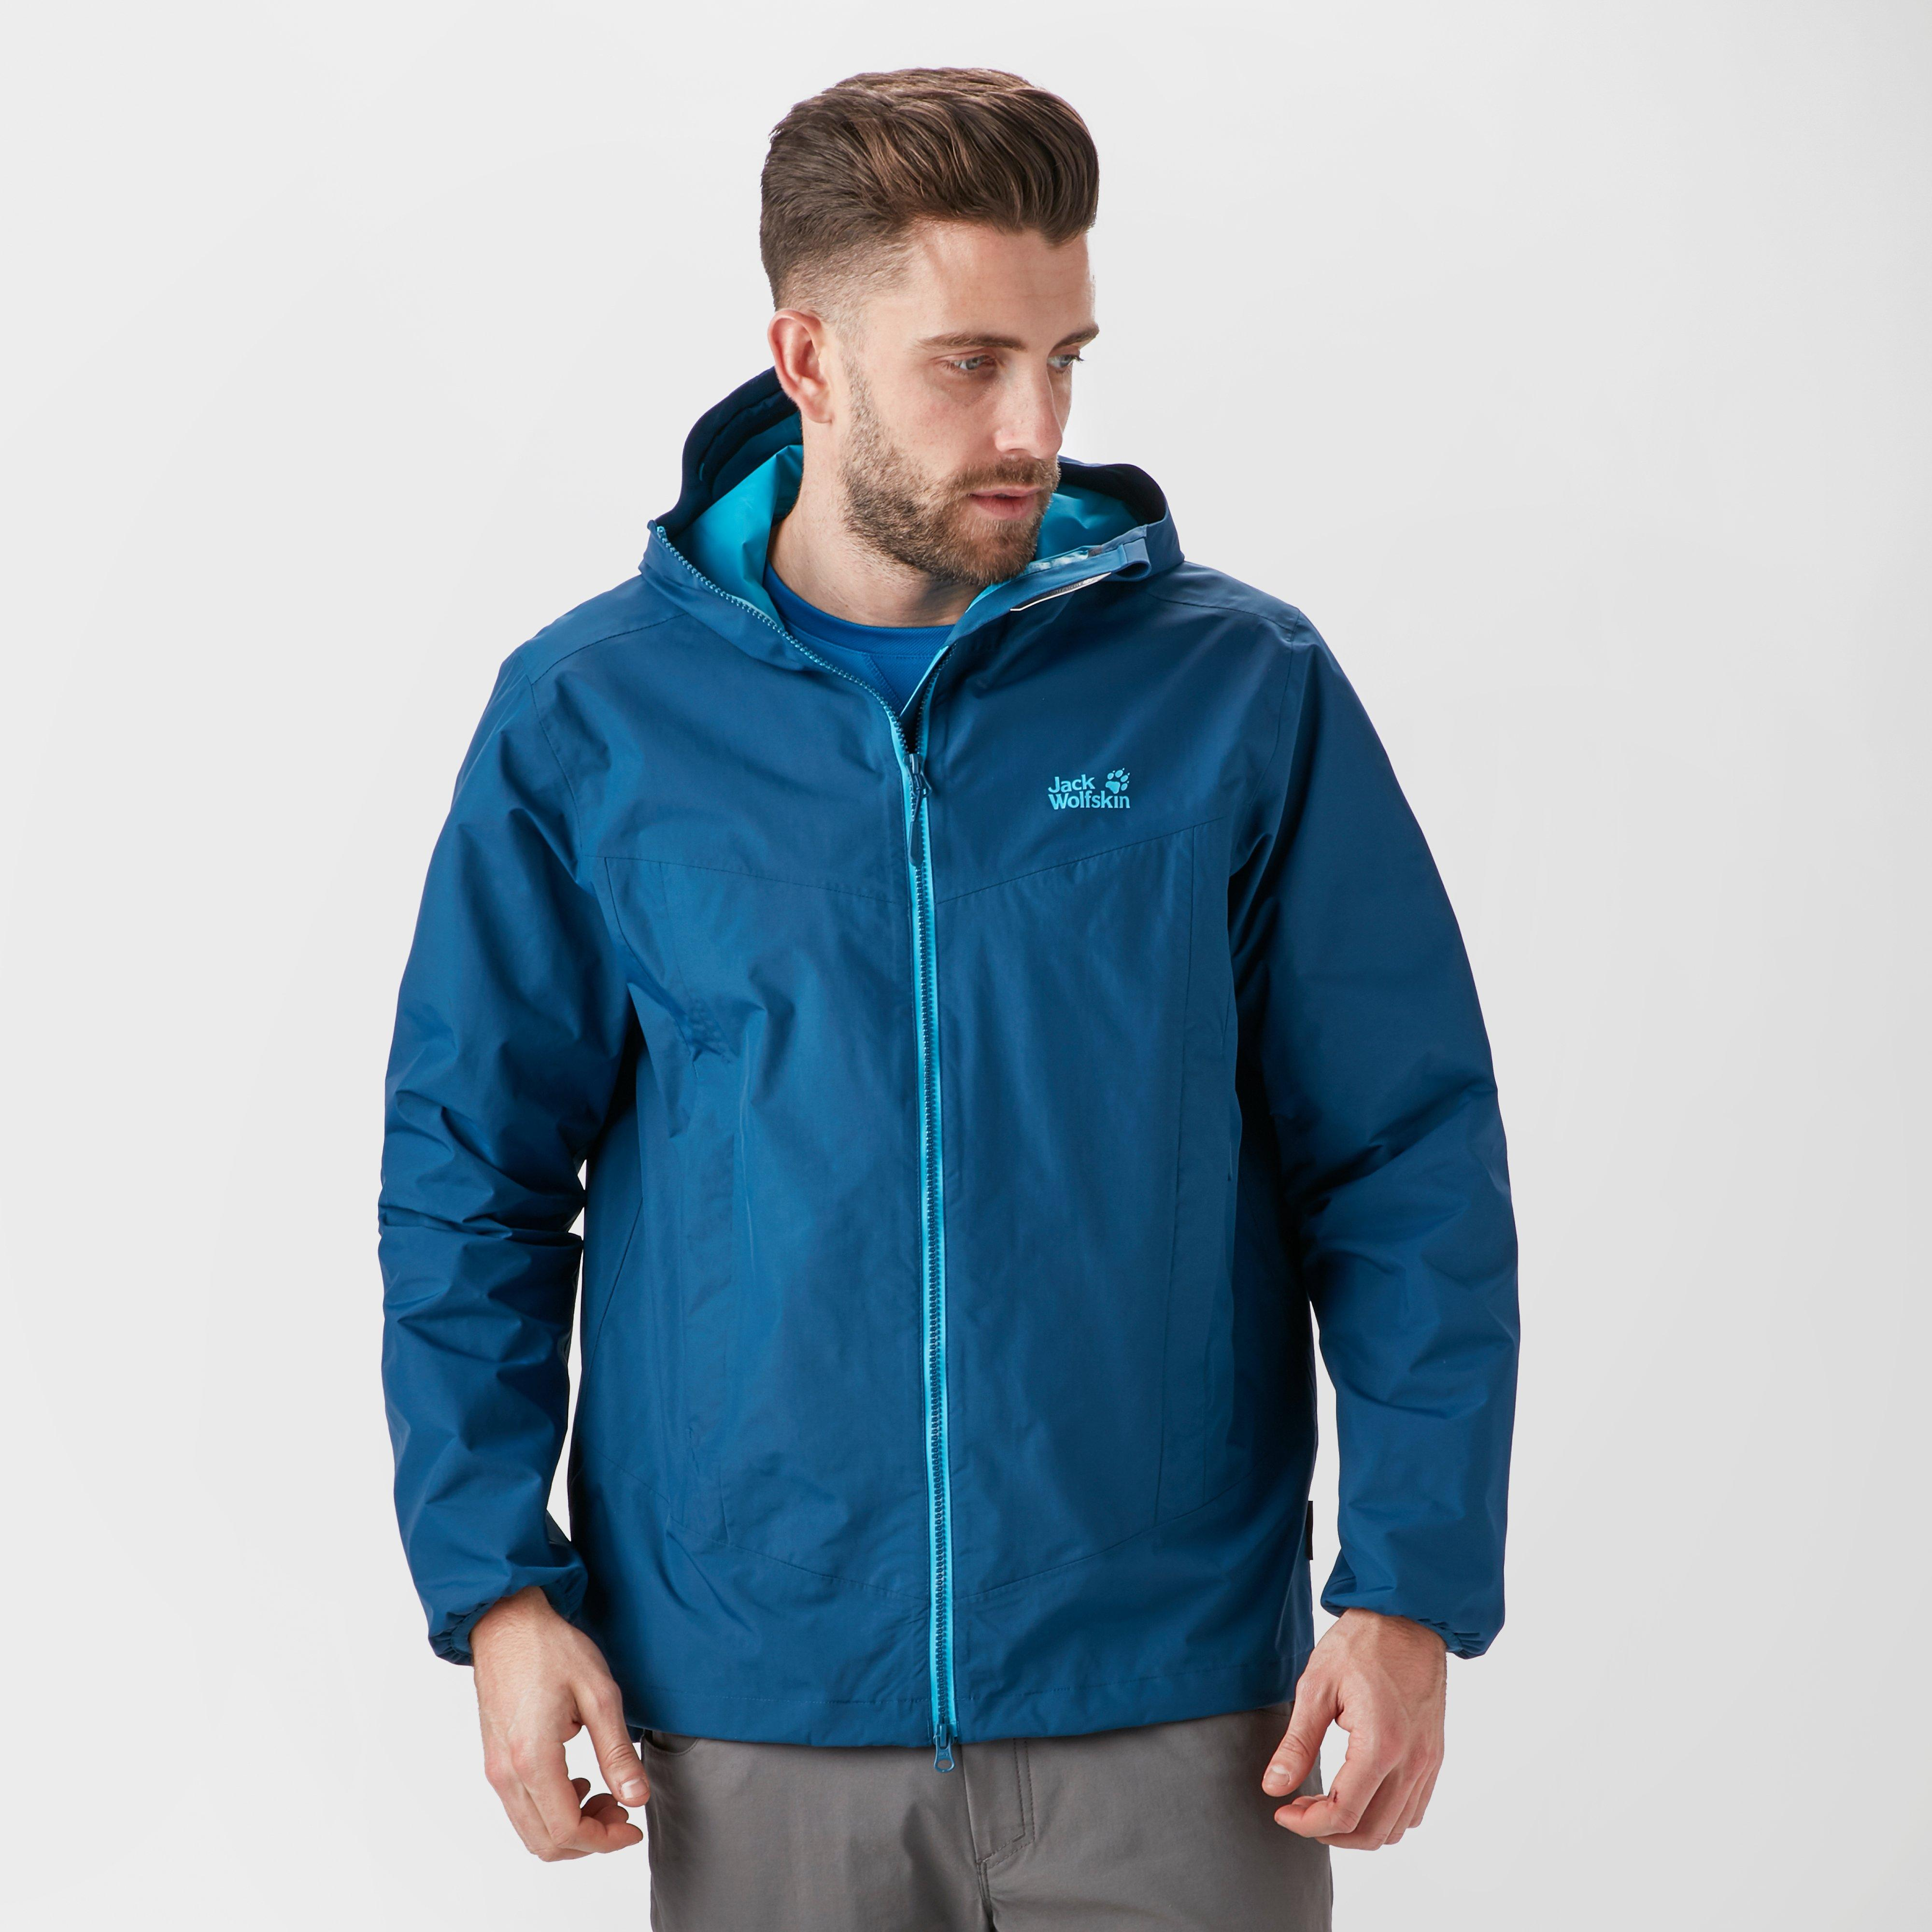 60b1ded0fde Jack Wolfskin Men's Colourburst Jacket, Blue - Mirror Online